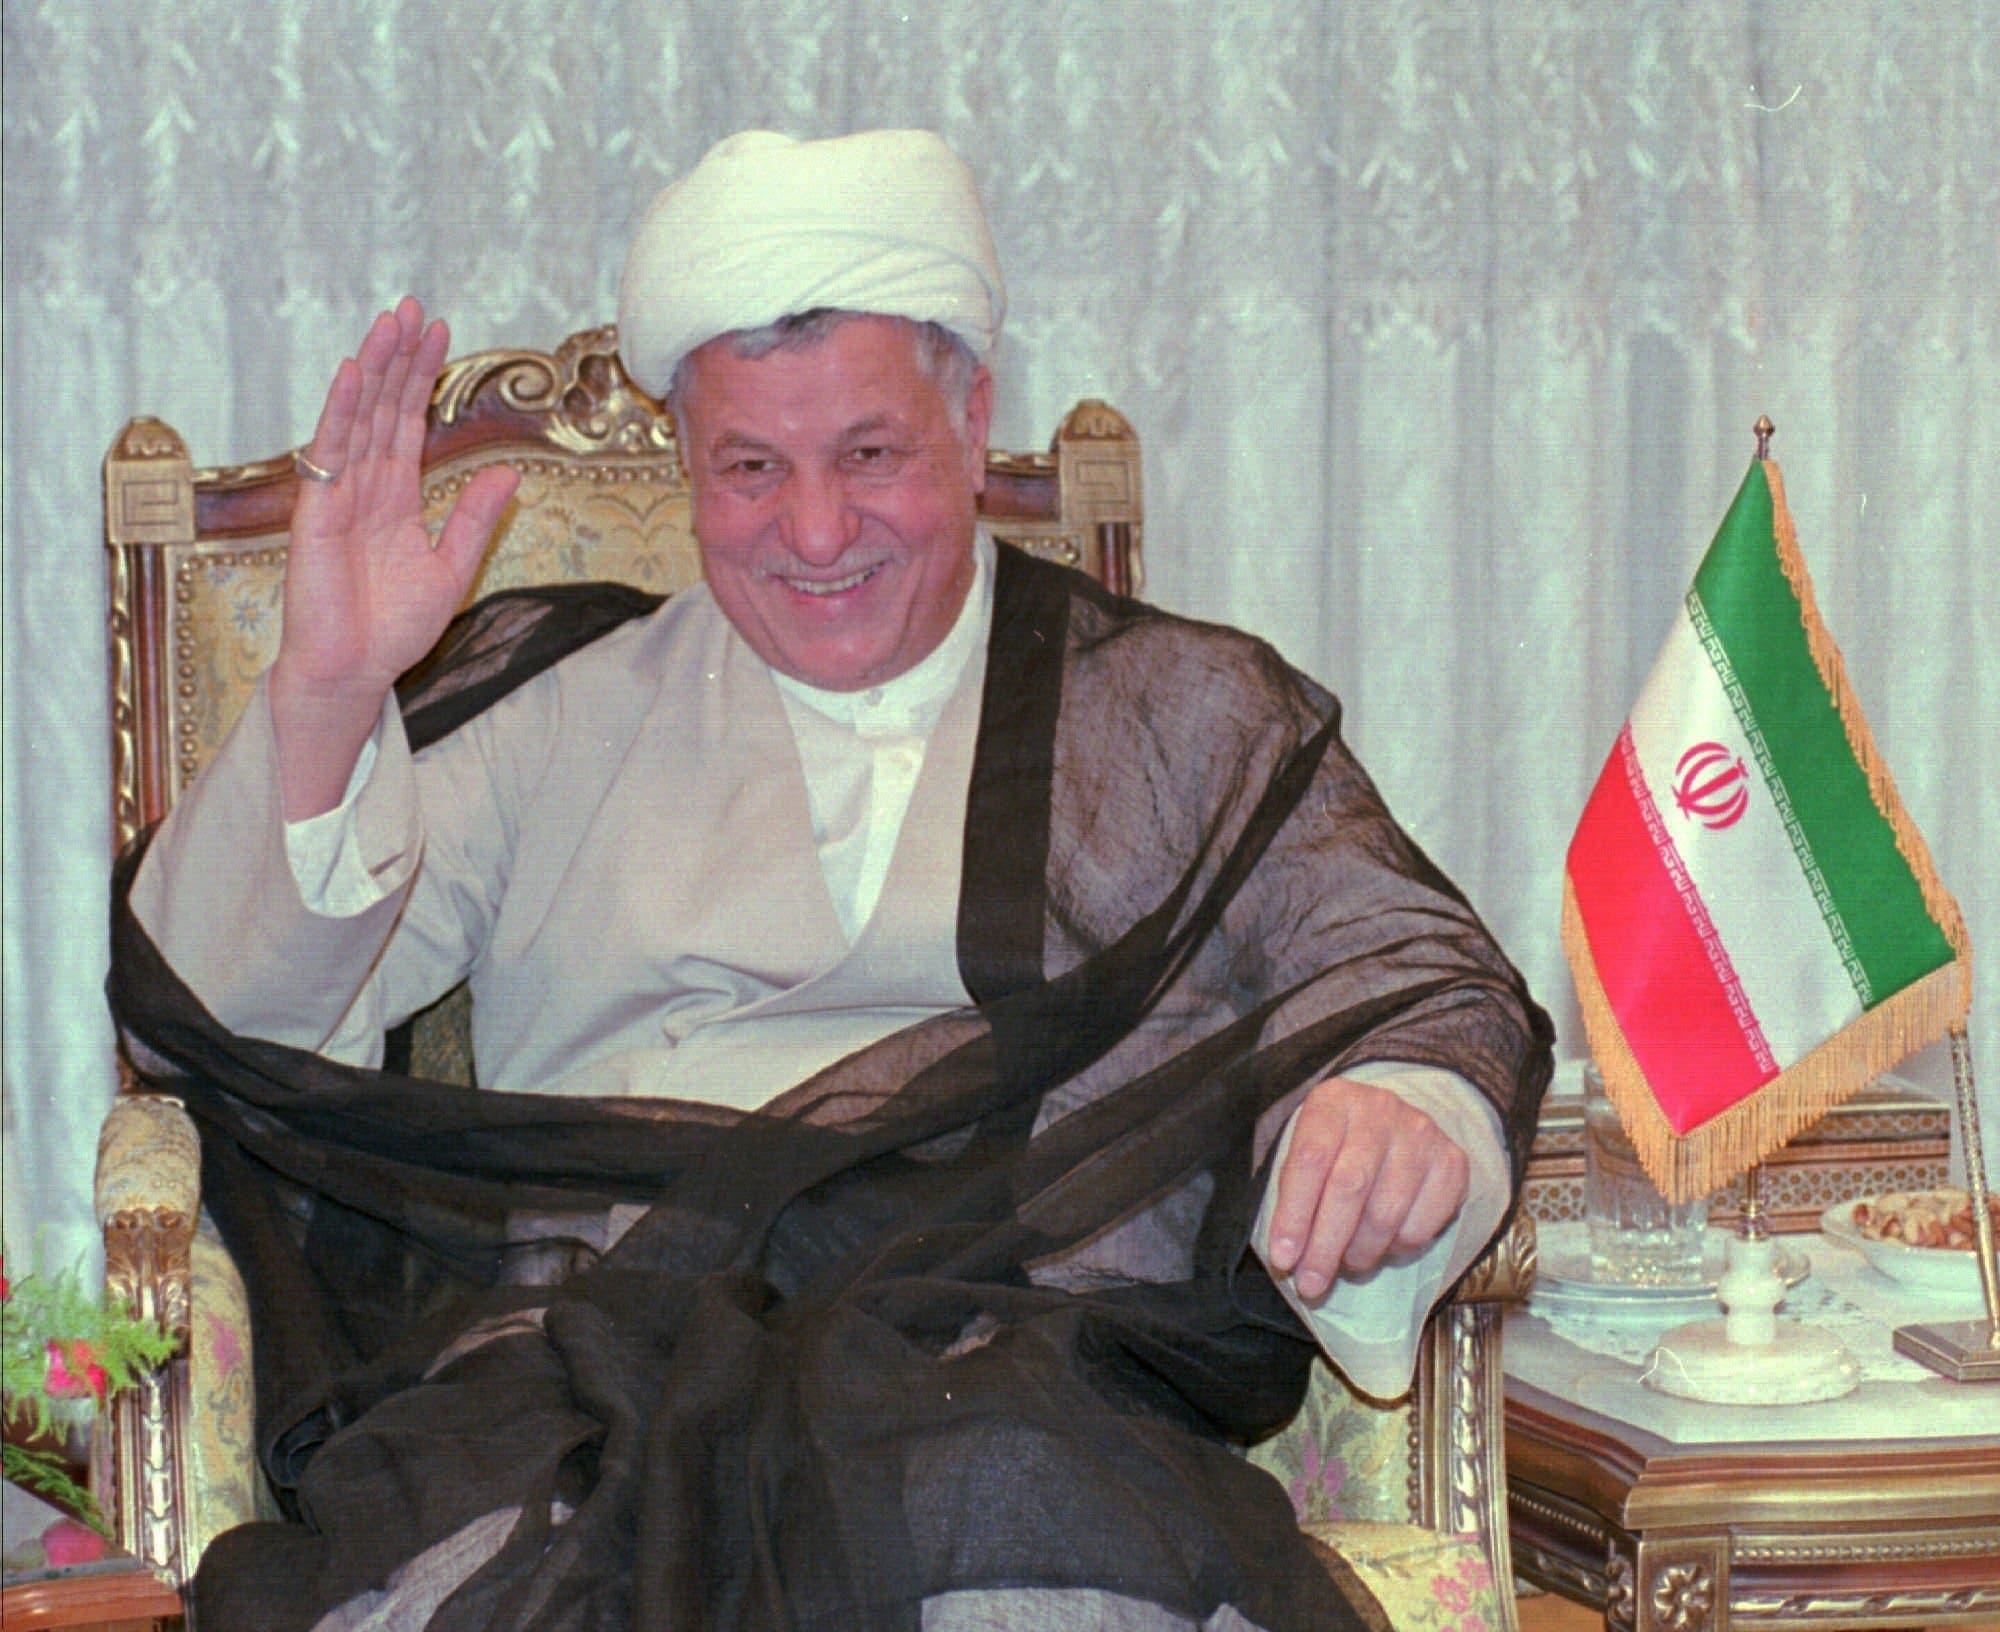 Hashem Rafsanjani